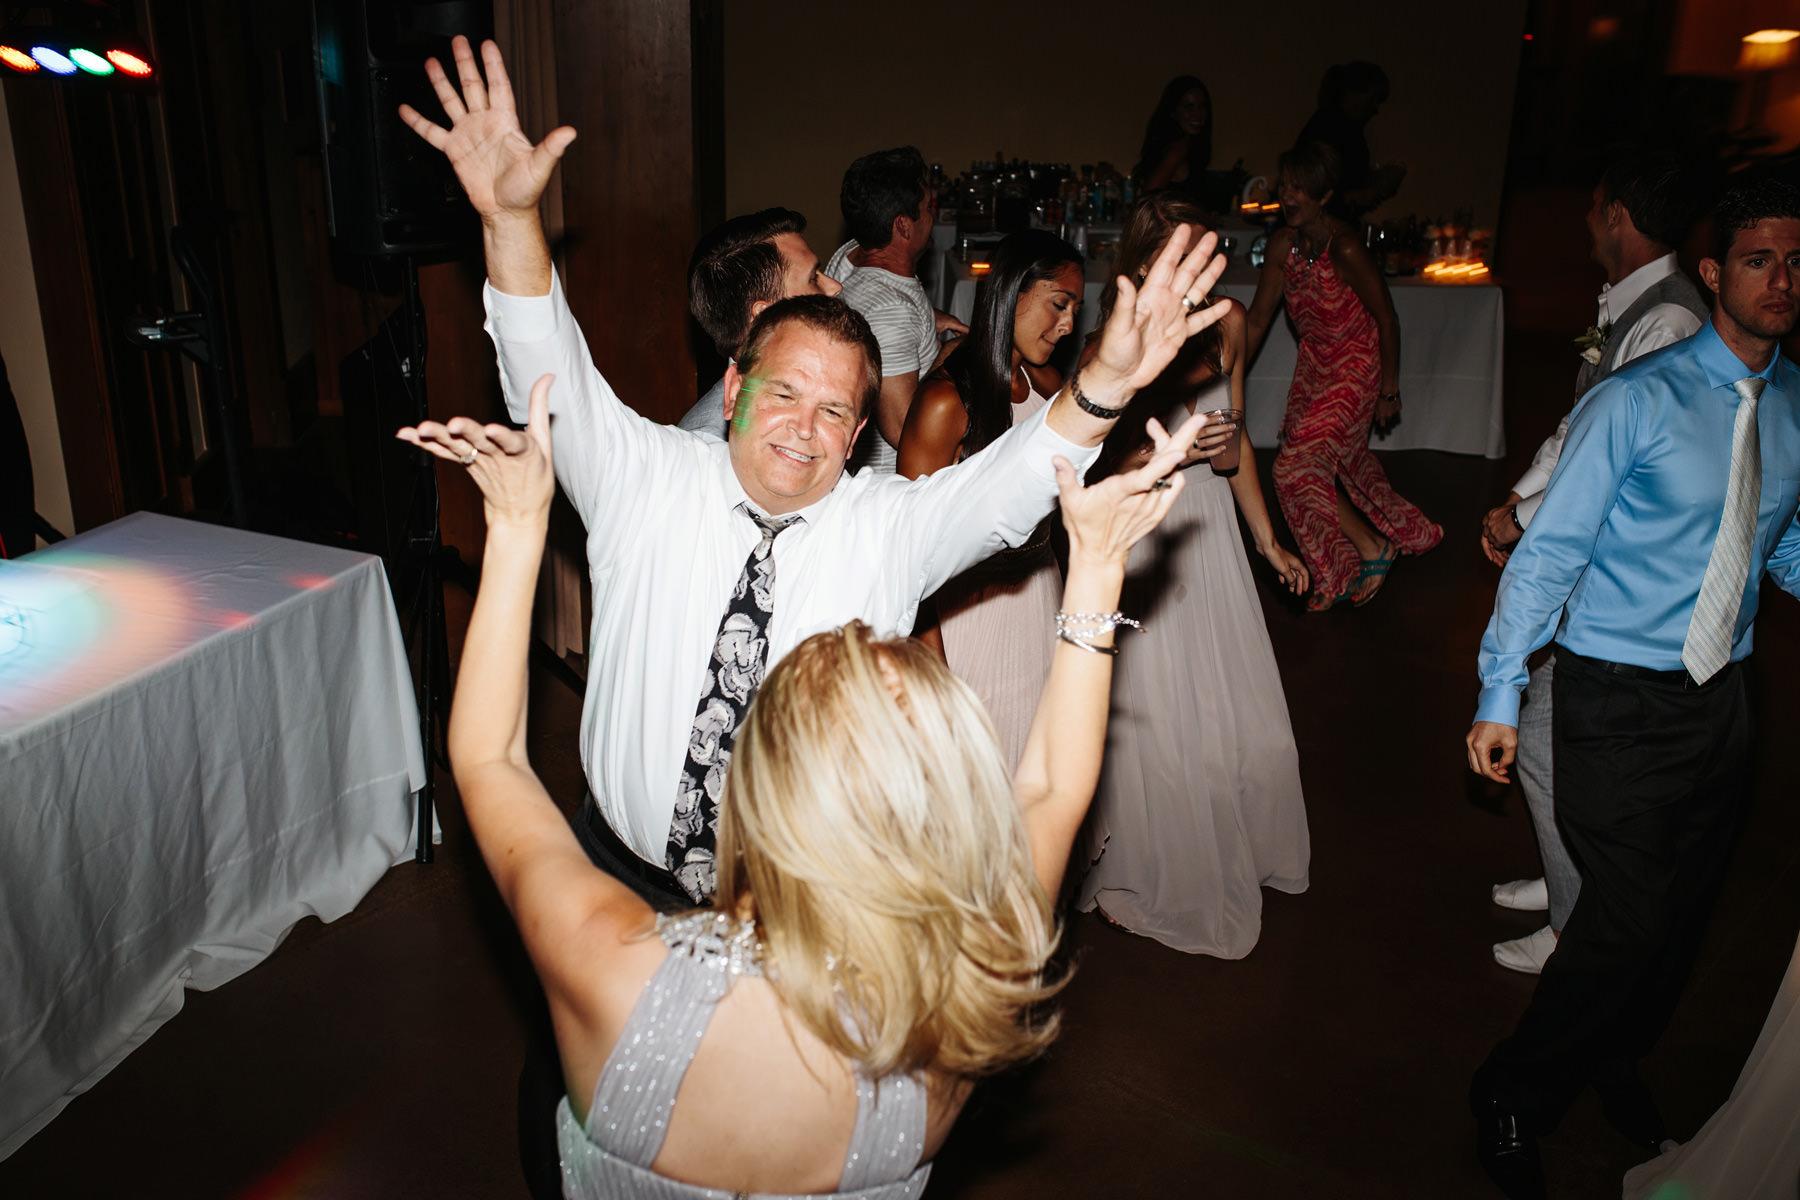 Vail Colorado Wedding Deck_ Kindling Wedding Photography95.JPG